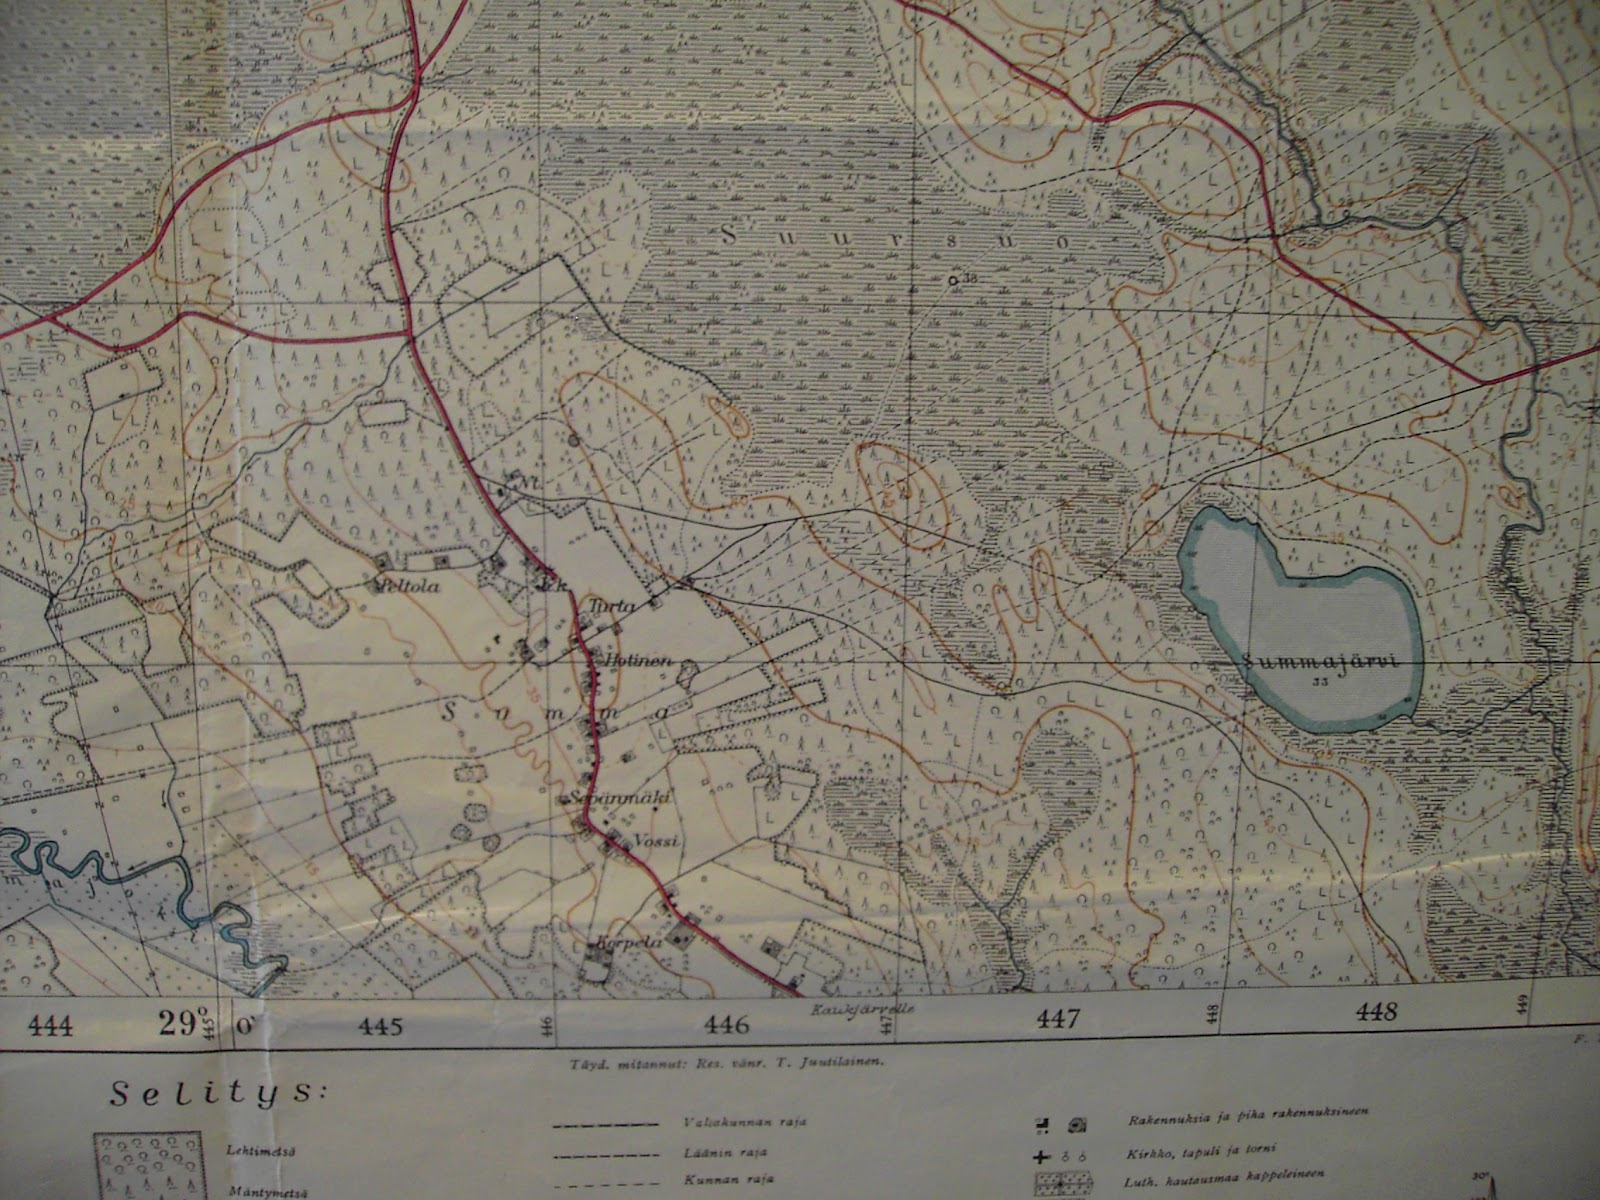 Sotiemme Kartat Summan Kartta